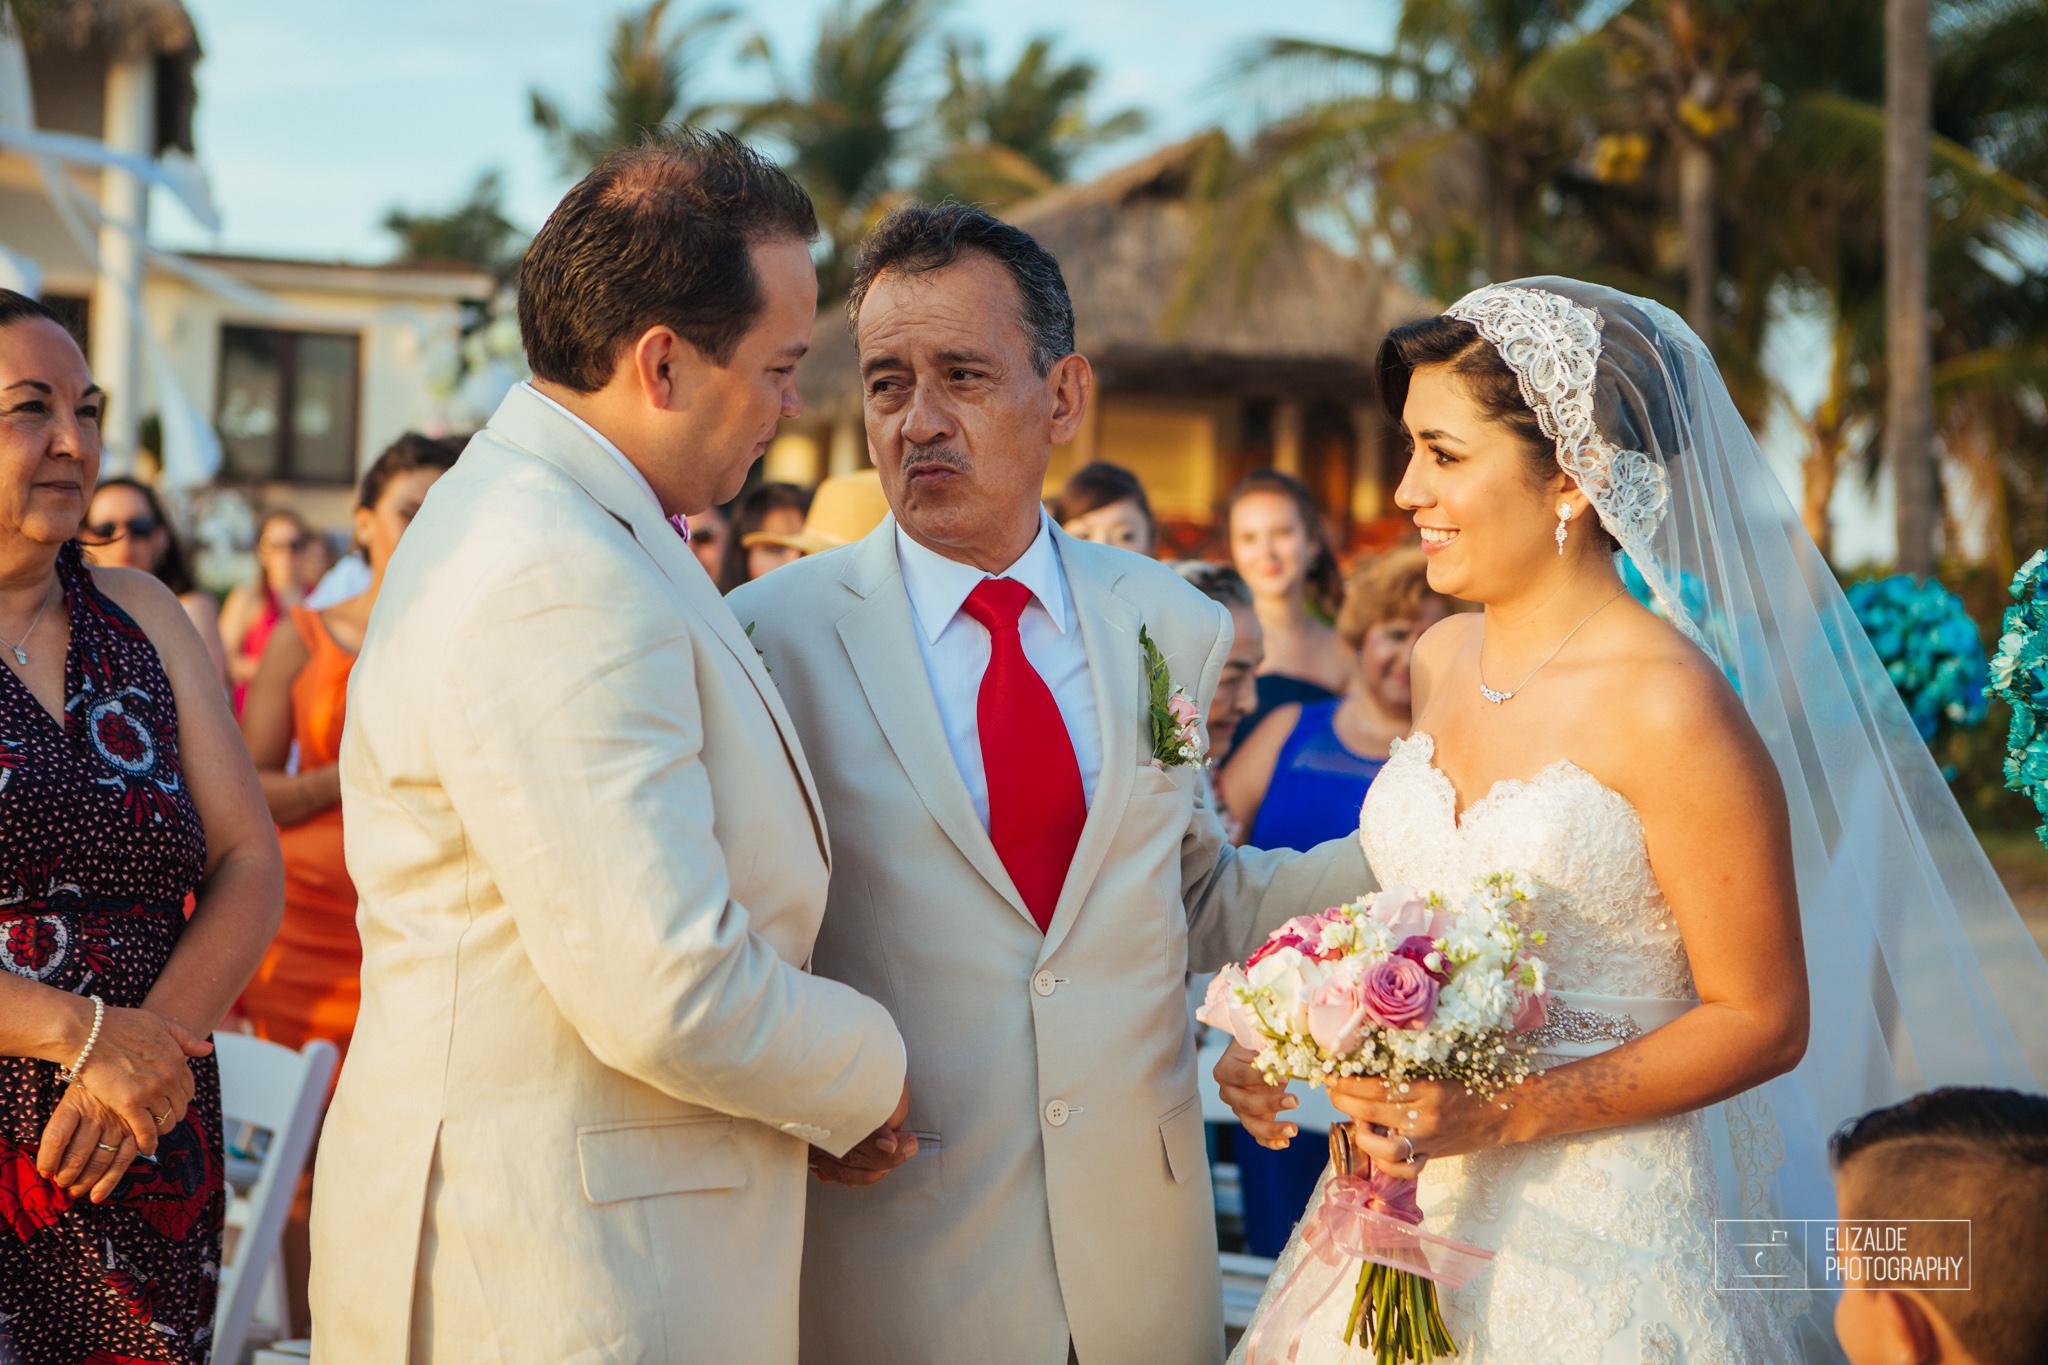 Pay and Ferran_Acapulco_Destination Wedding_Elizalde Photography-81.jpg